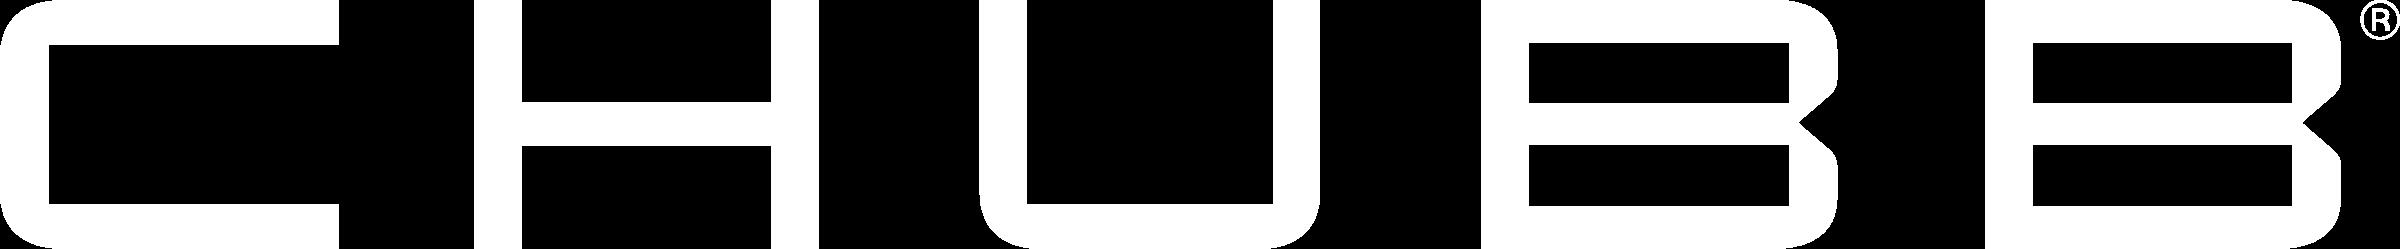 Chubb Logo PNG Transparent & SVG Vector.